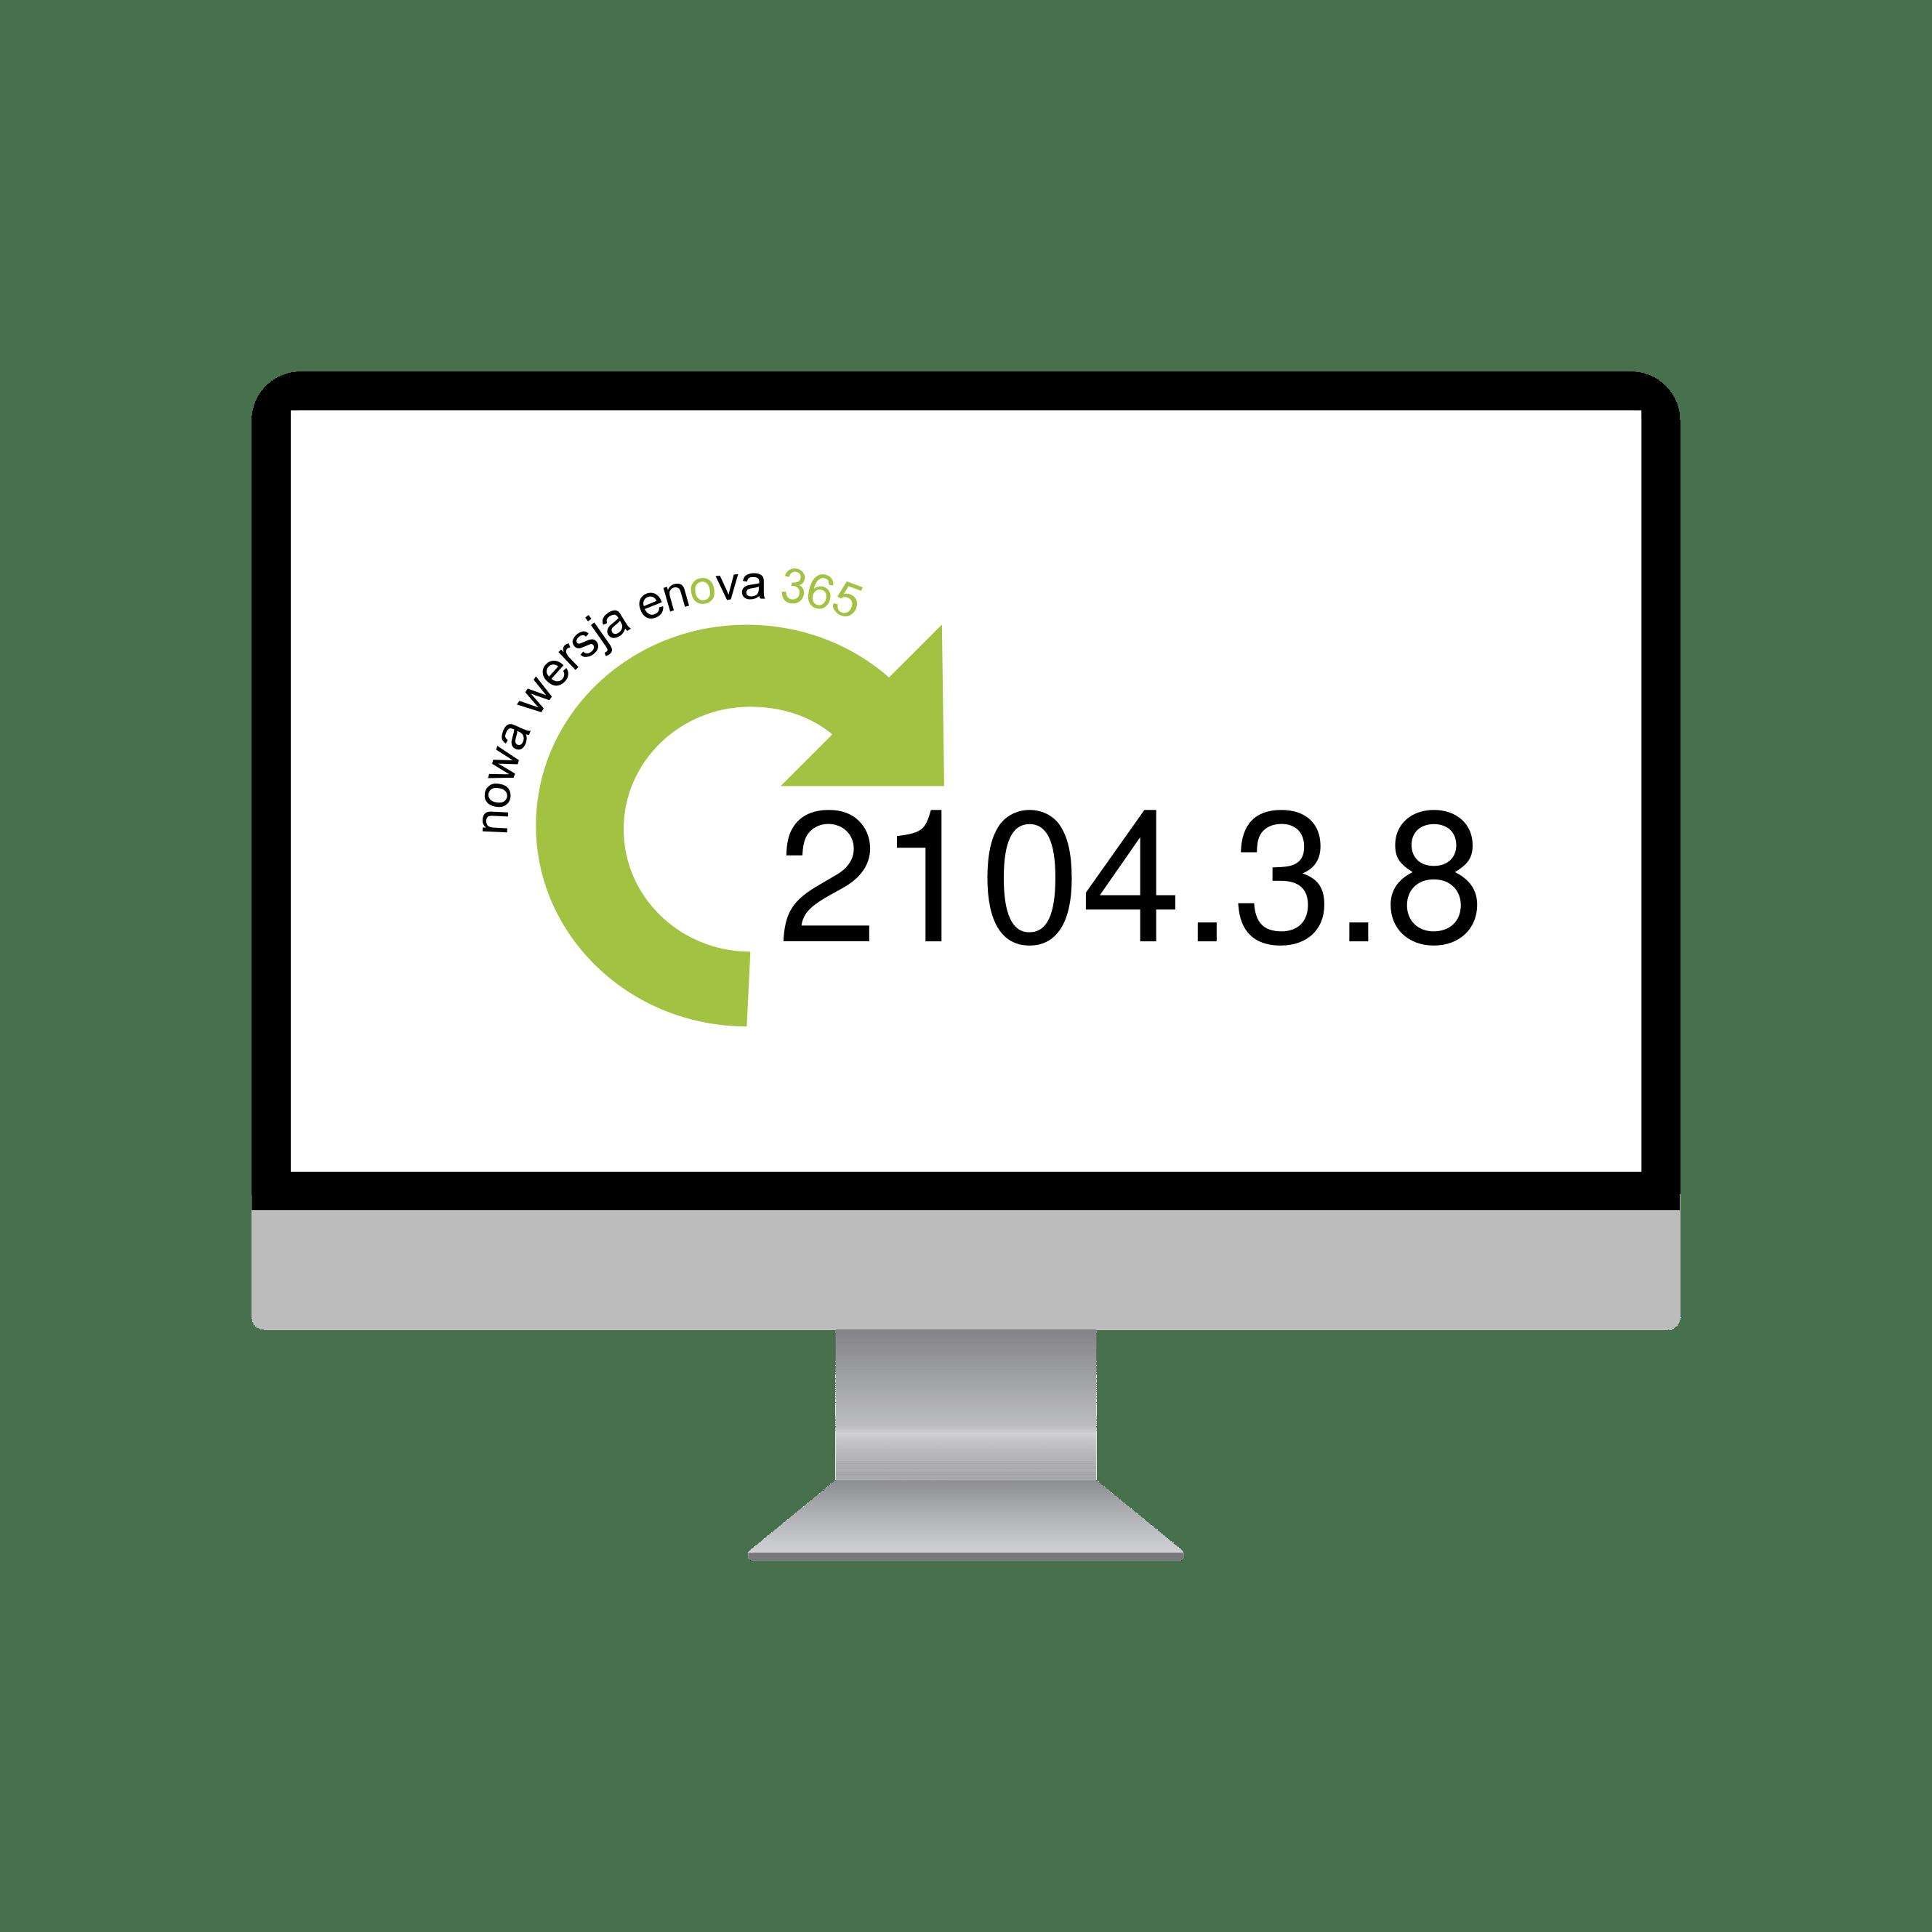 enova365 wersja 2104.3.8